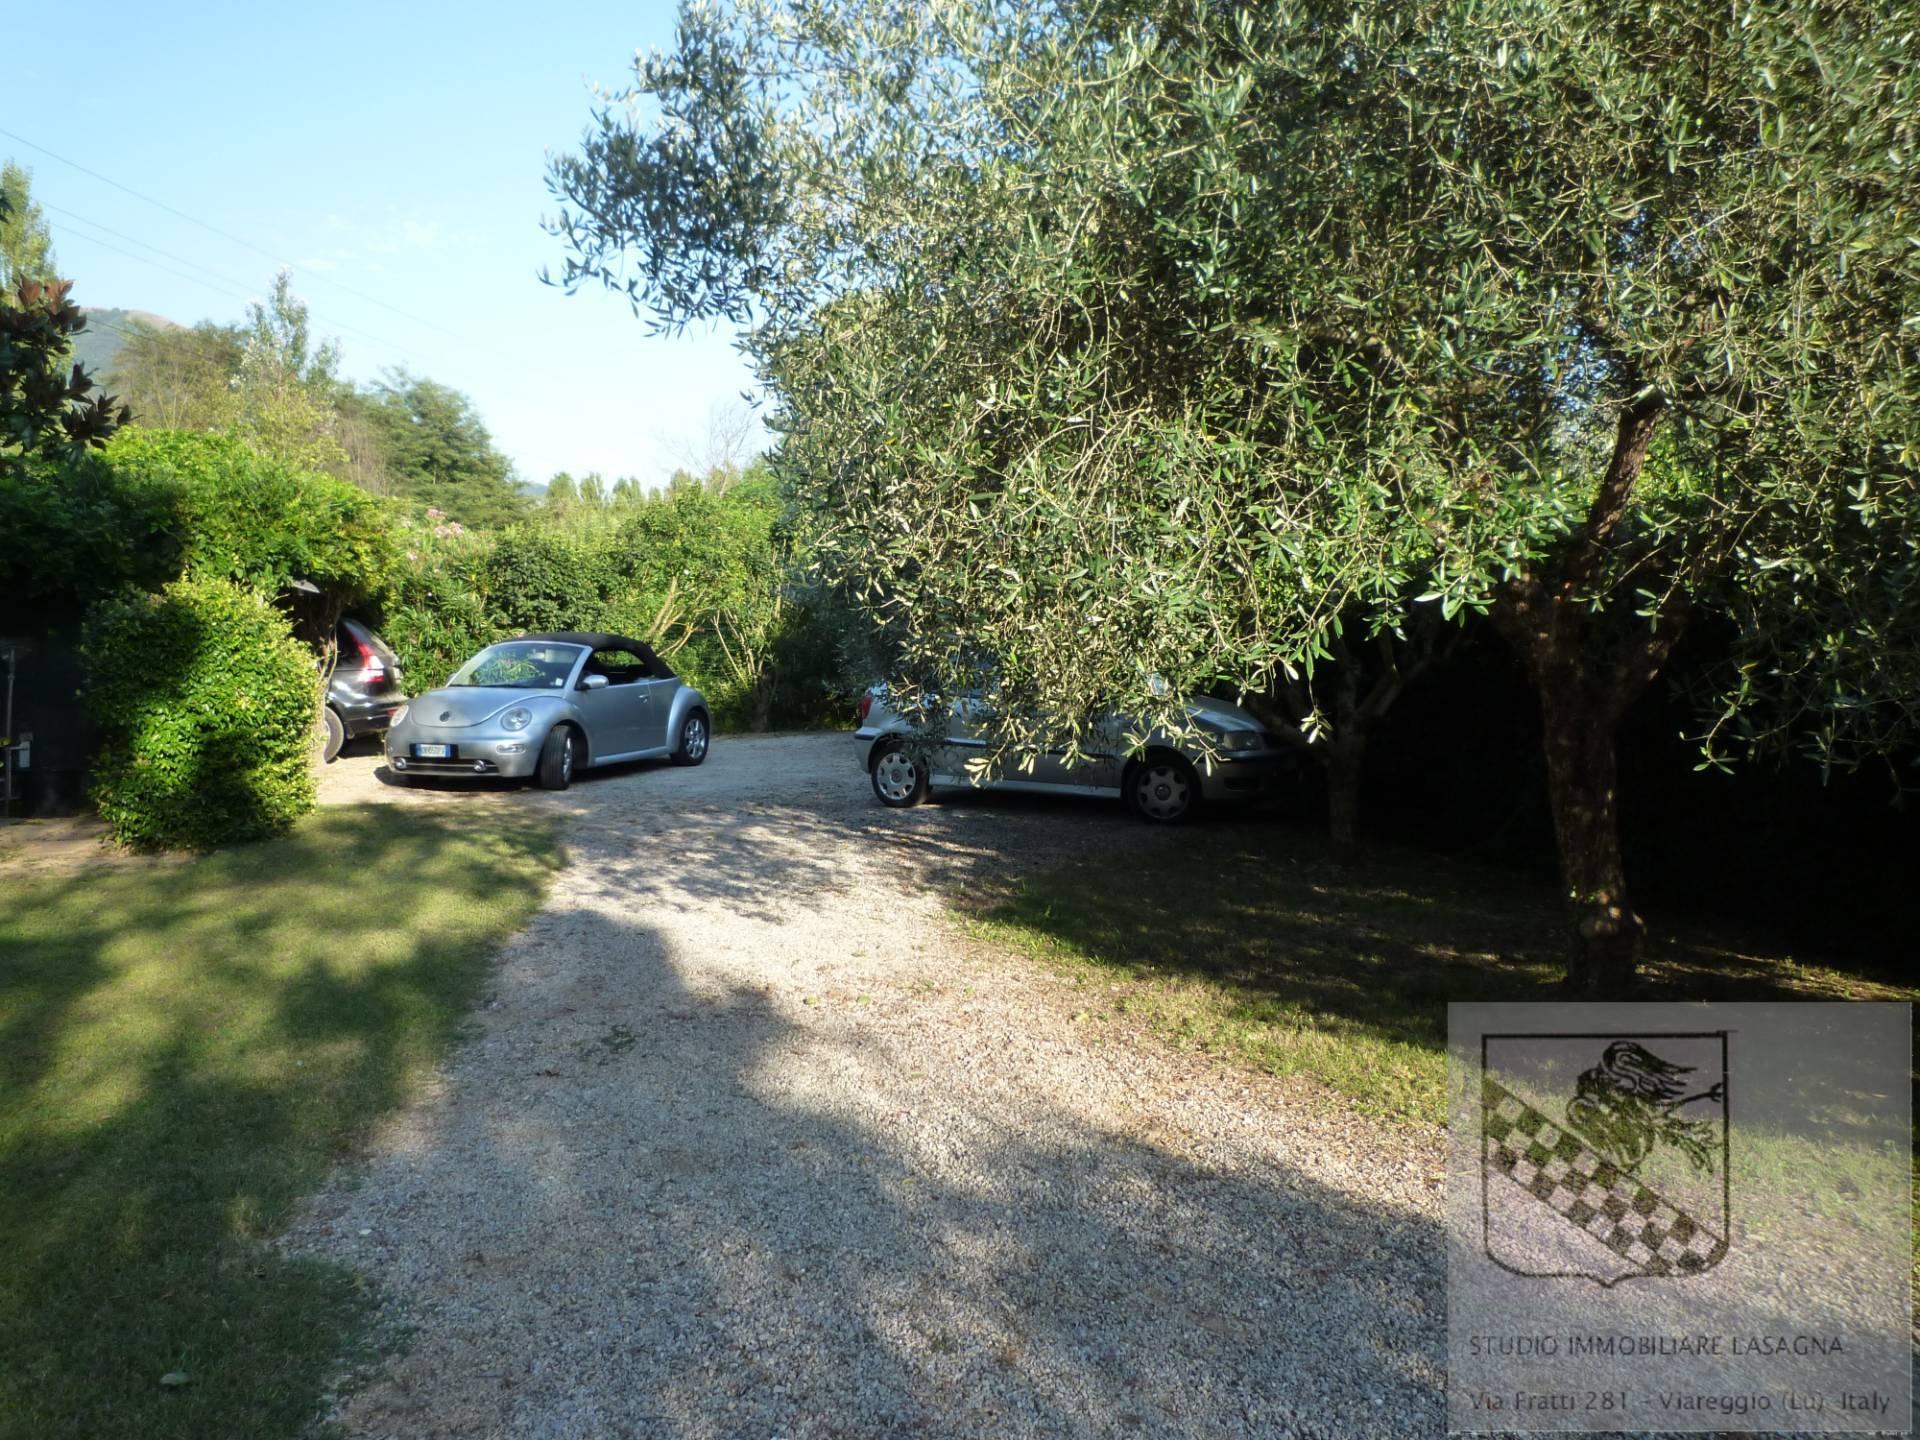 Villa in Vendita a Camaiore: 5 locali, 120 mq - Foto 10